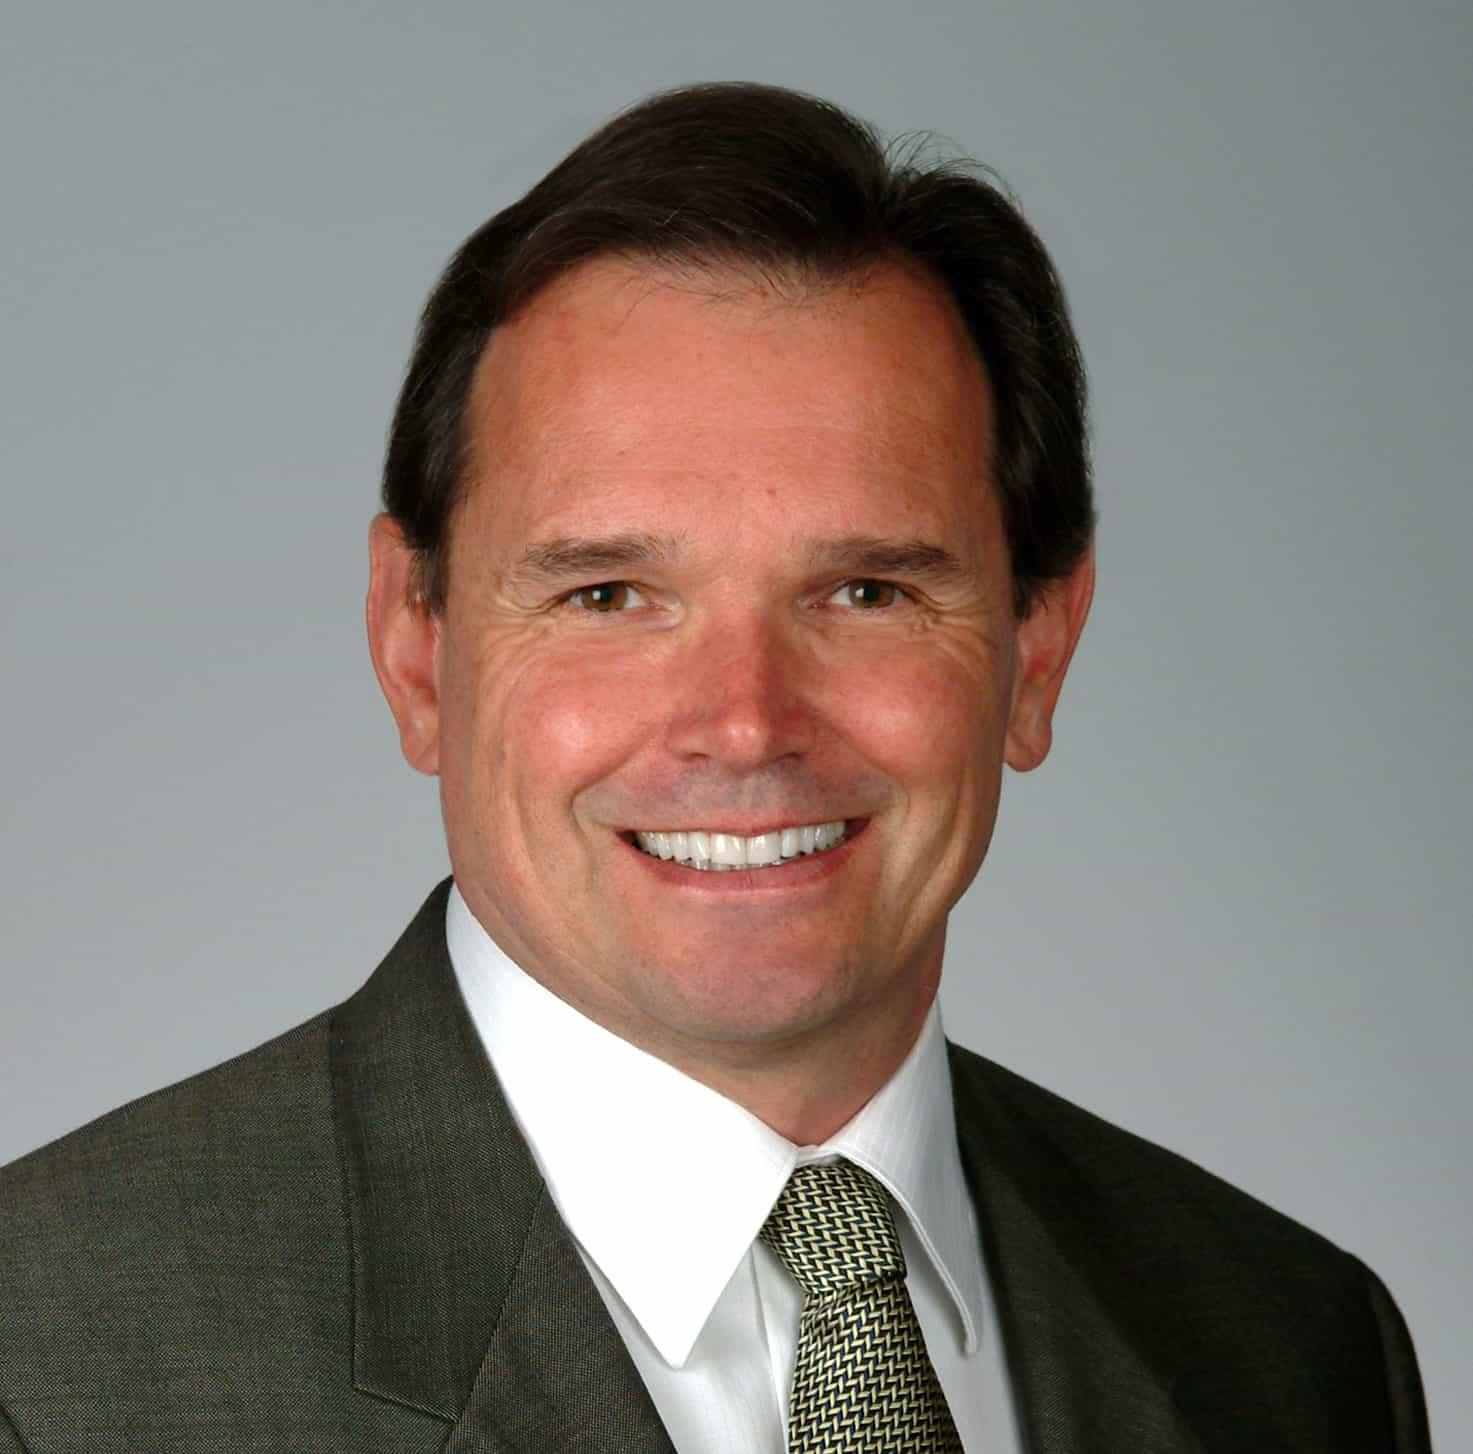 Frank J. Overdyk, MSEE, MD